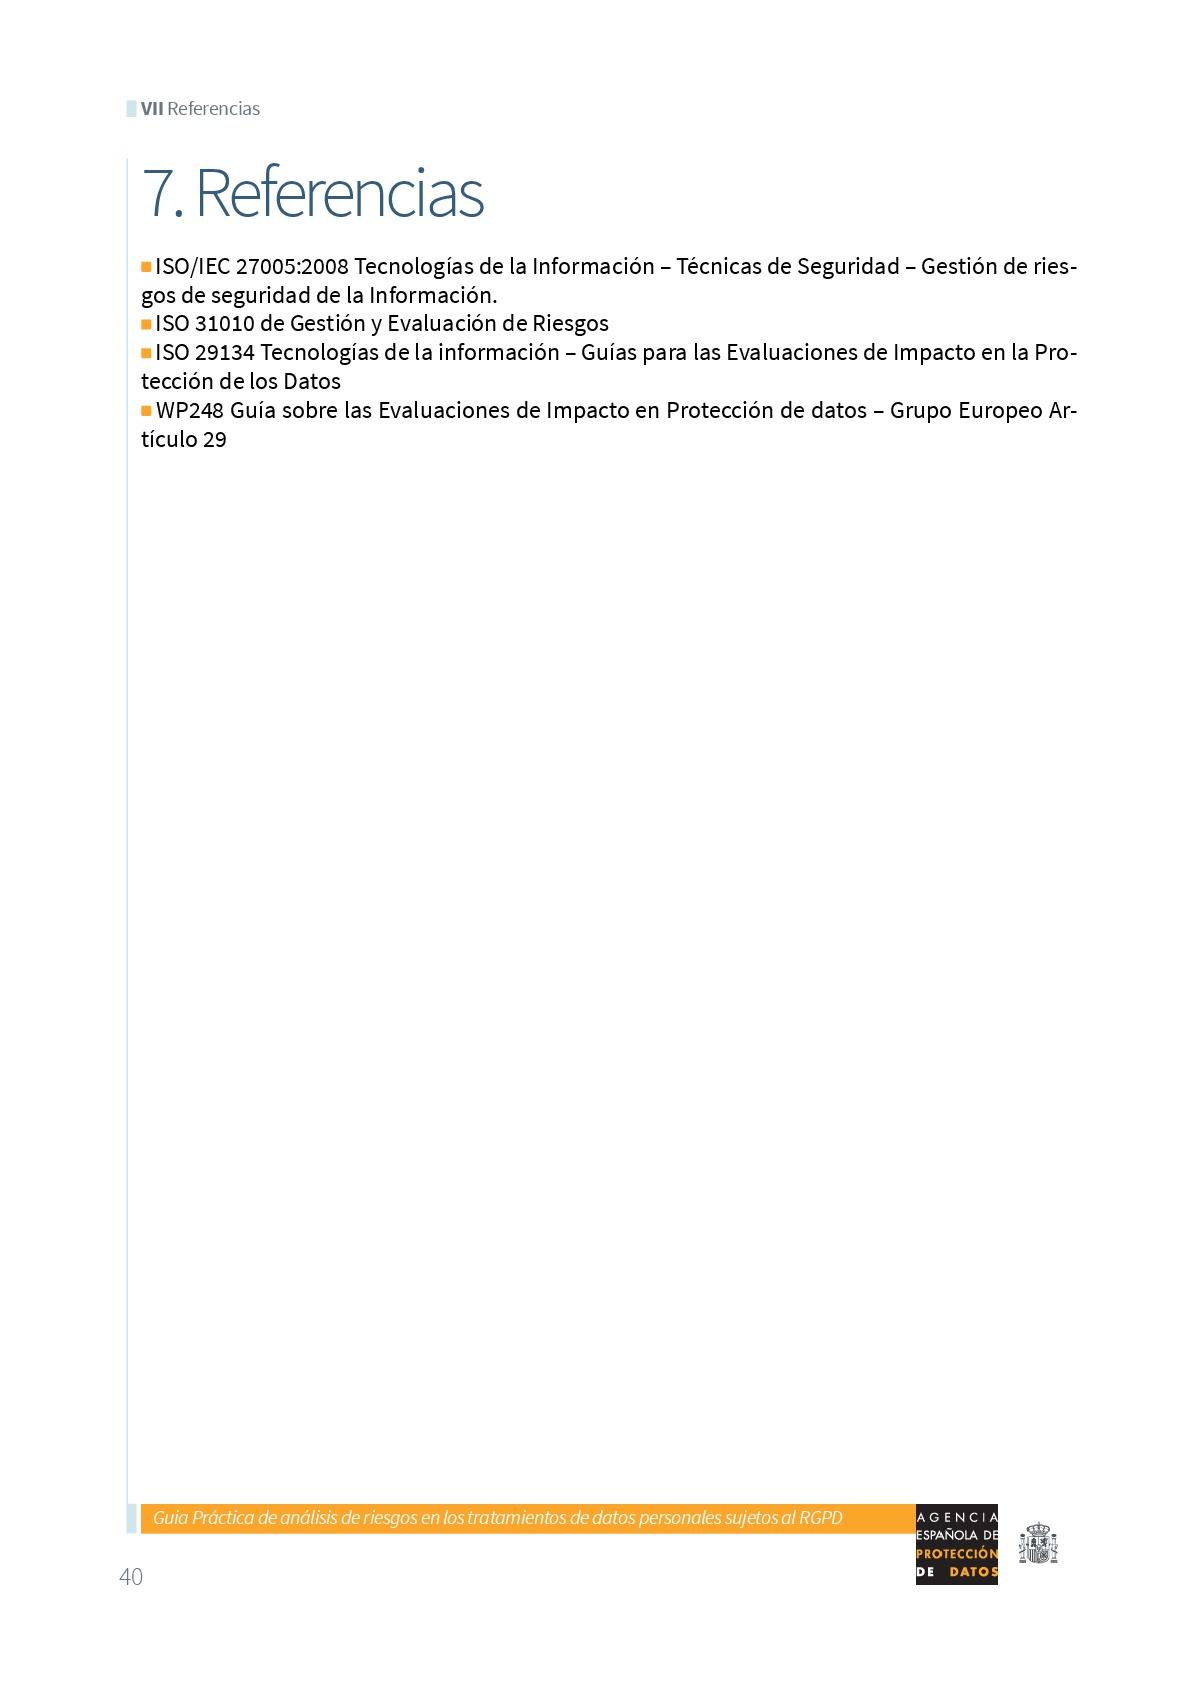 AnalisisDeRiesgosRGPD-041